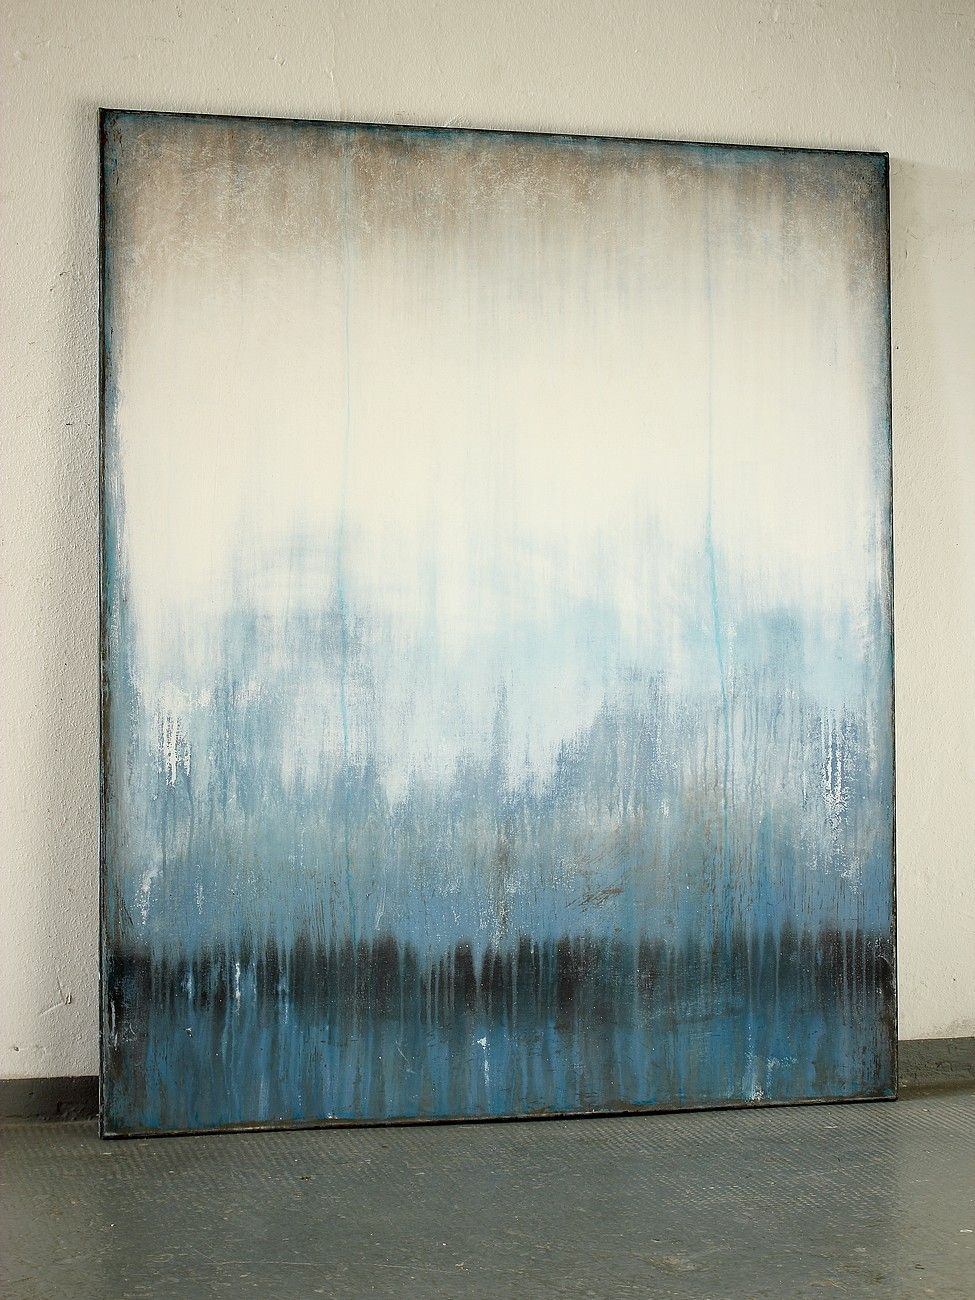 201 6 1 20 x 1 00 cm mischtechnik auf leinwand abstrakte kunst malerei leinwand. Black Bedroom Furniture Sets. Home Design Ideas